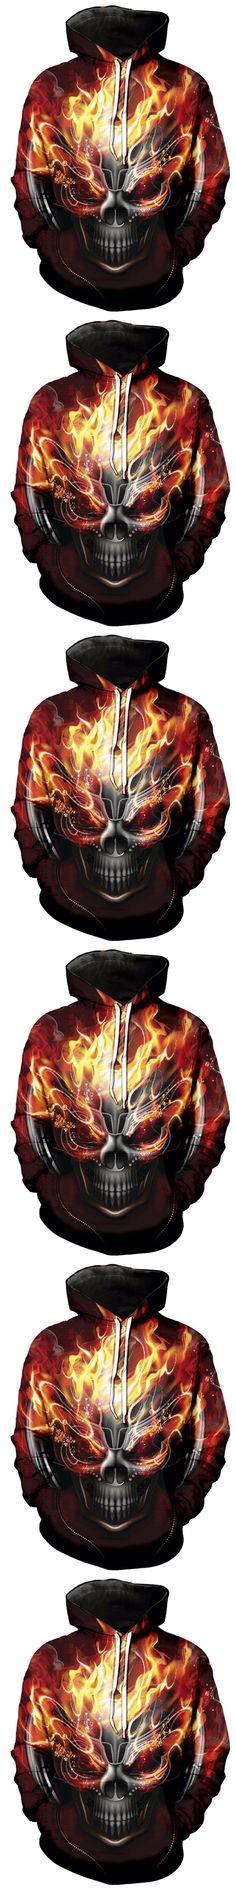 2017 NEW FASHION MEN WOMEN Burning Flame Skull HOODIE 3D Hoodie Sweatshirts Pullovers Autumn Tracksuit Winter Loose Thin Hoody